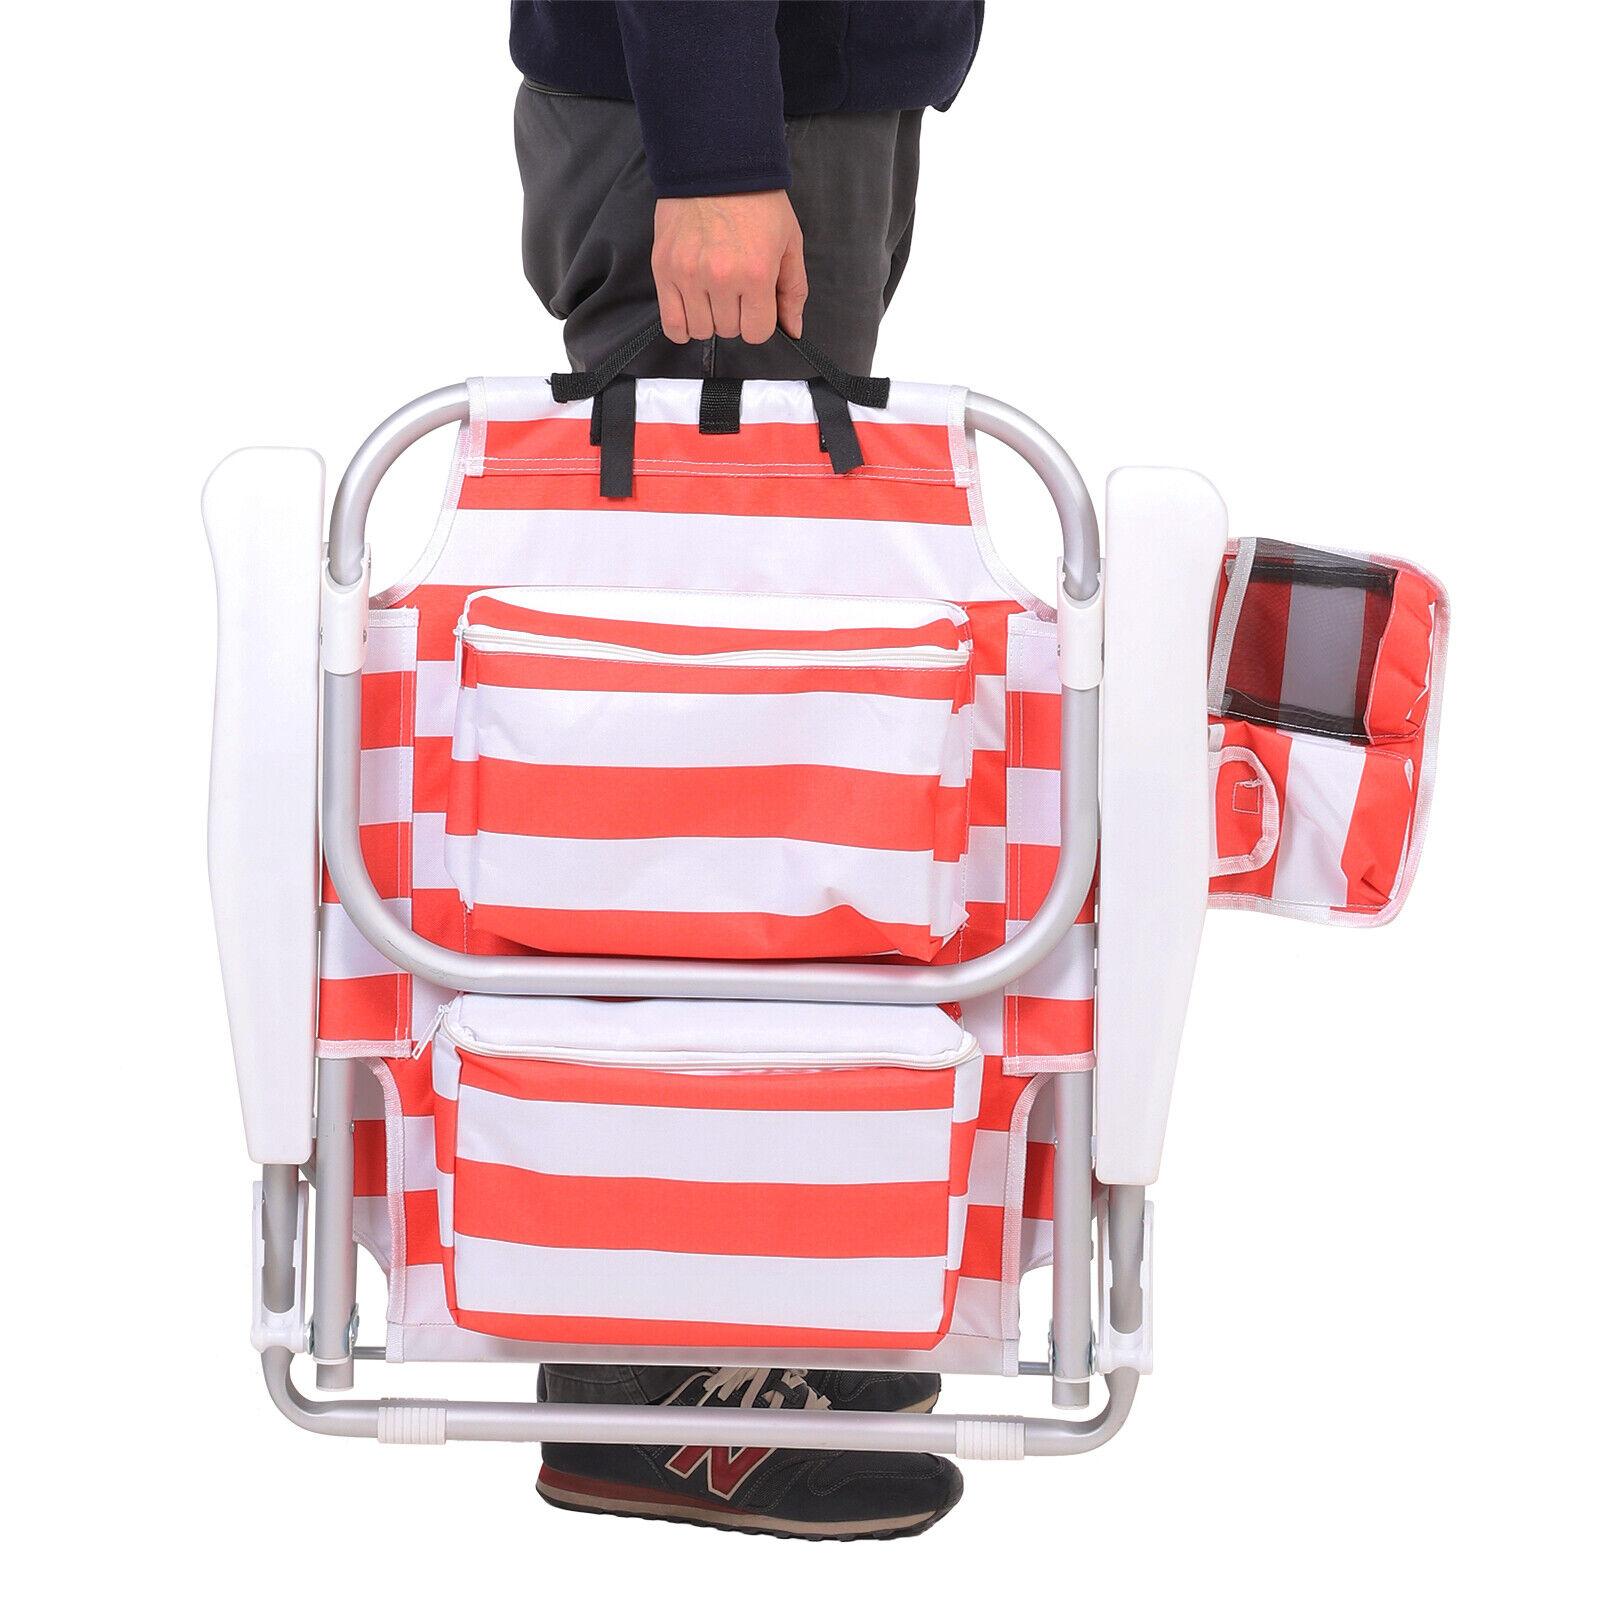 s l1600 - Strandstuhl Klappstuhl Liegestuhl abnehmbarer Kopfstütze Campingstuhl verstellba